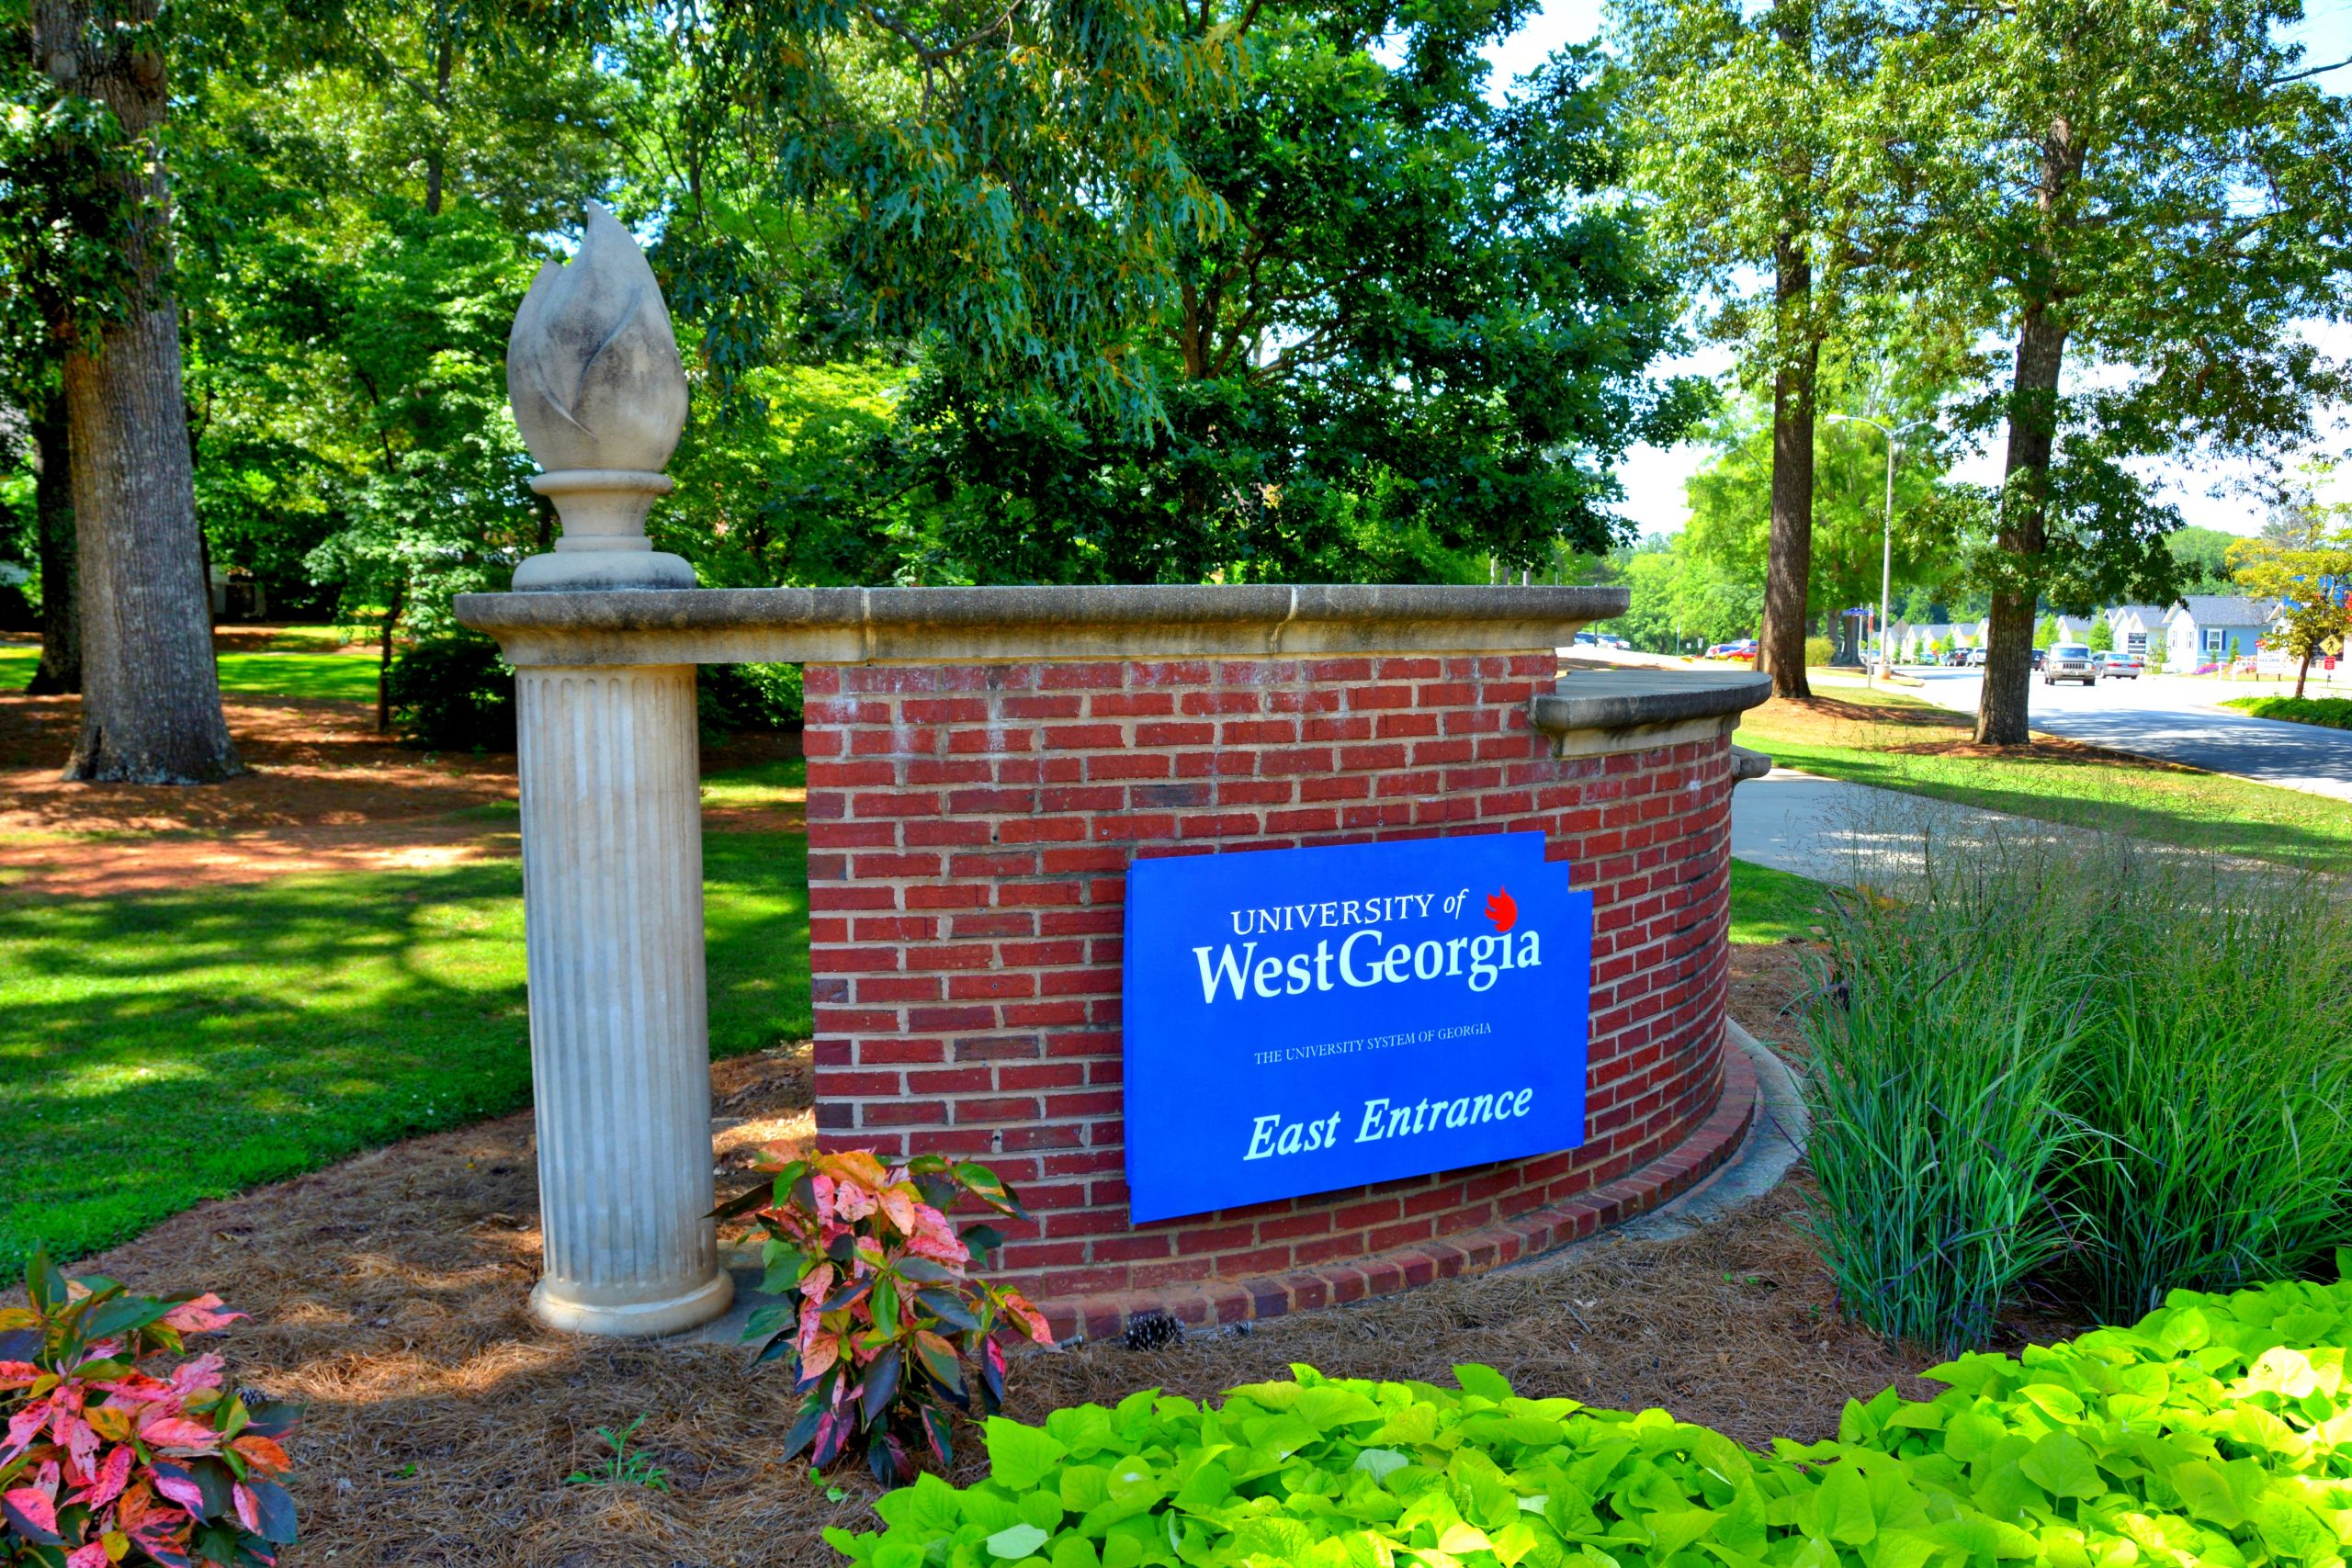 UWG (University of West GA) - GO WOLVES!